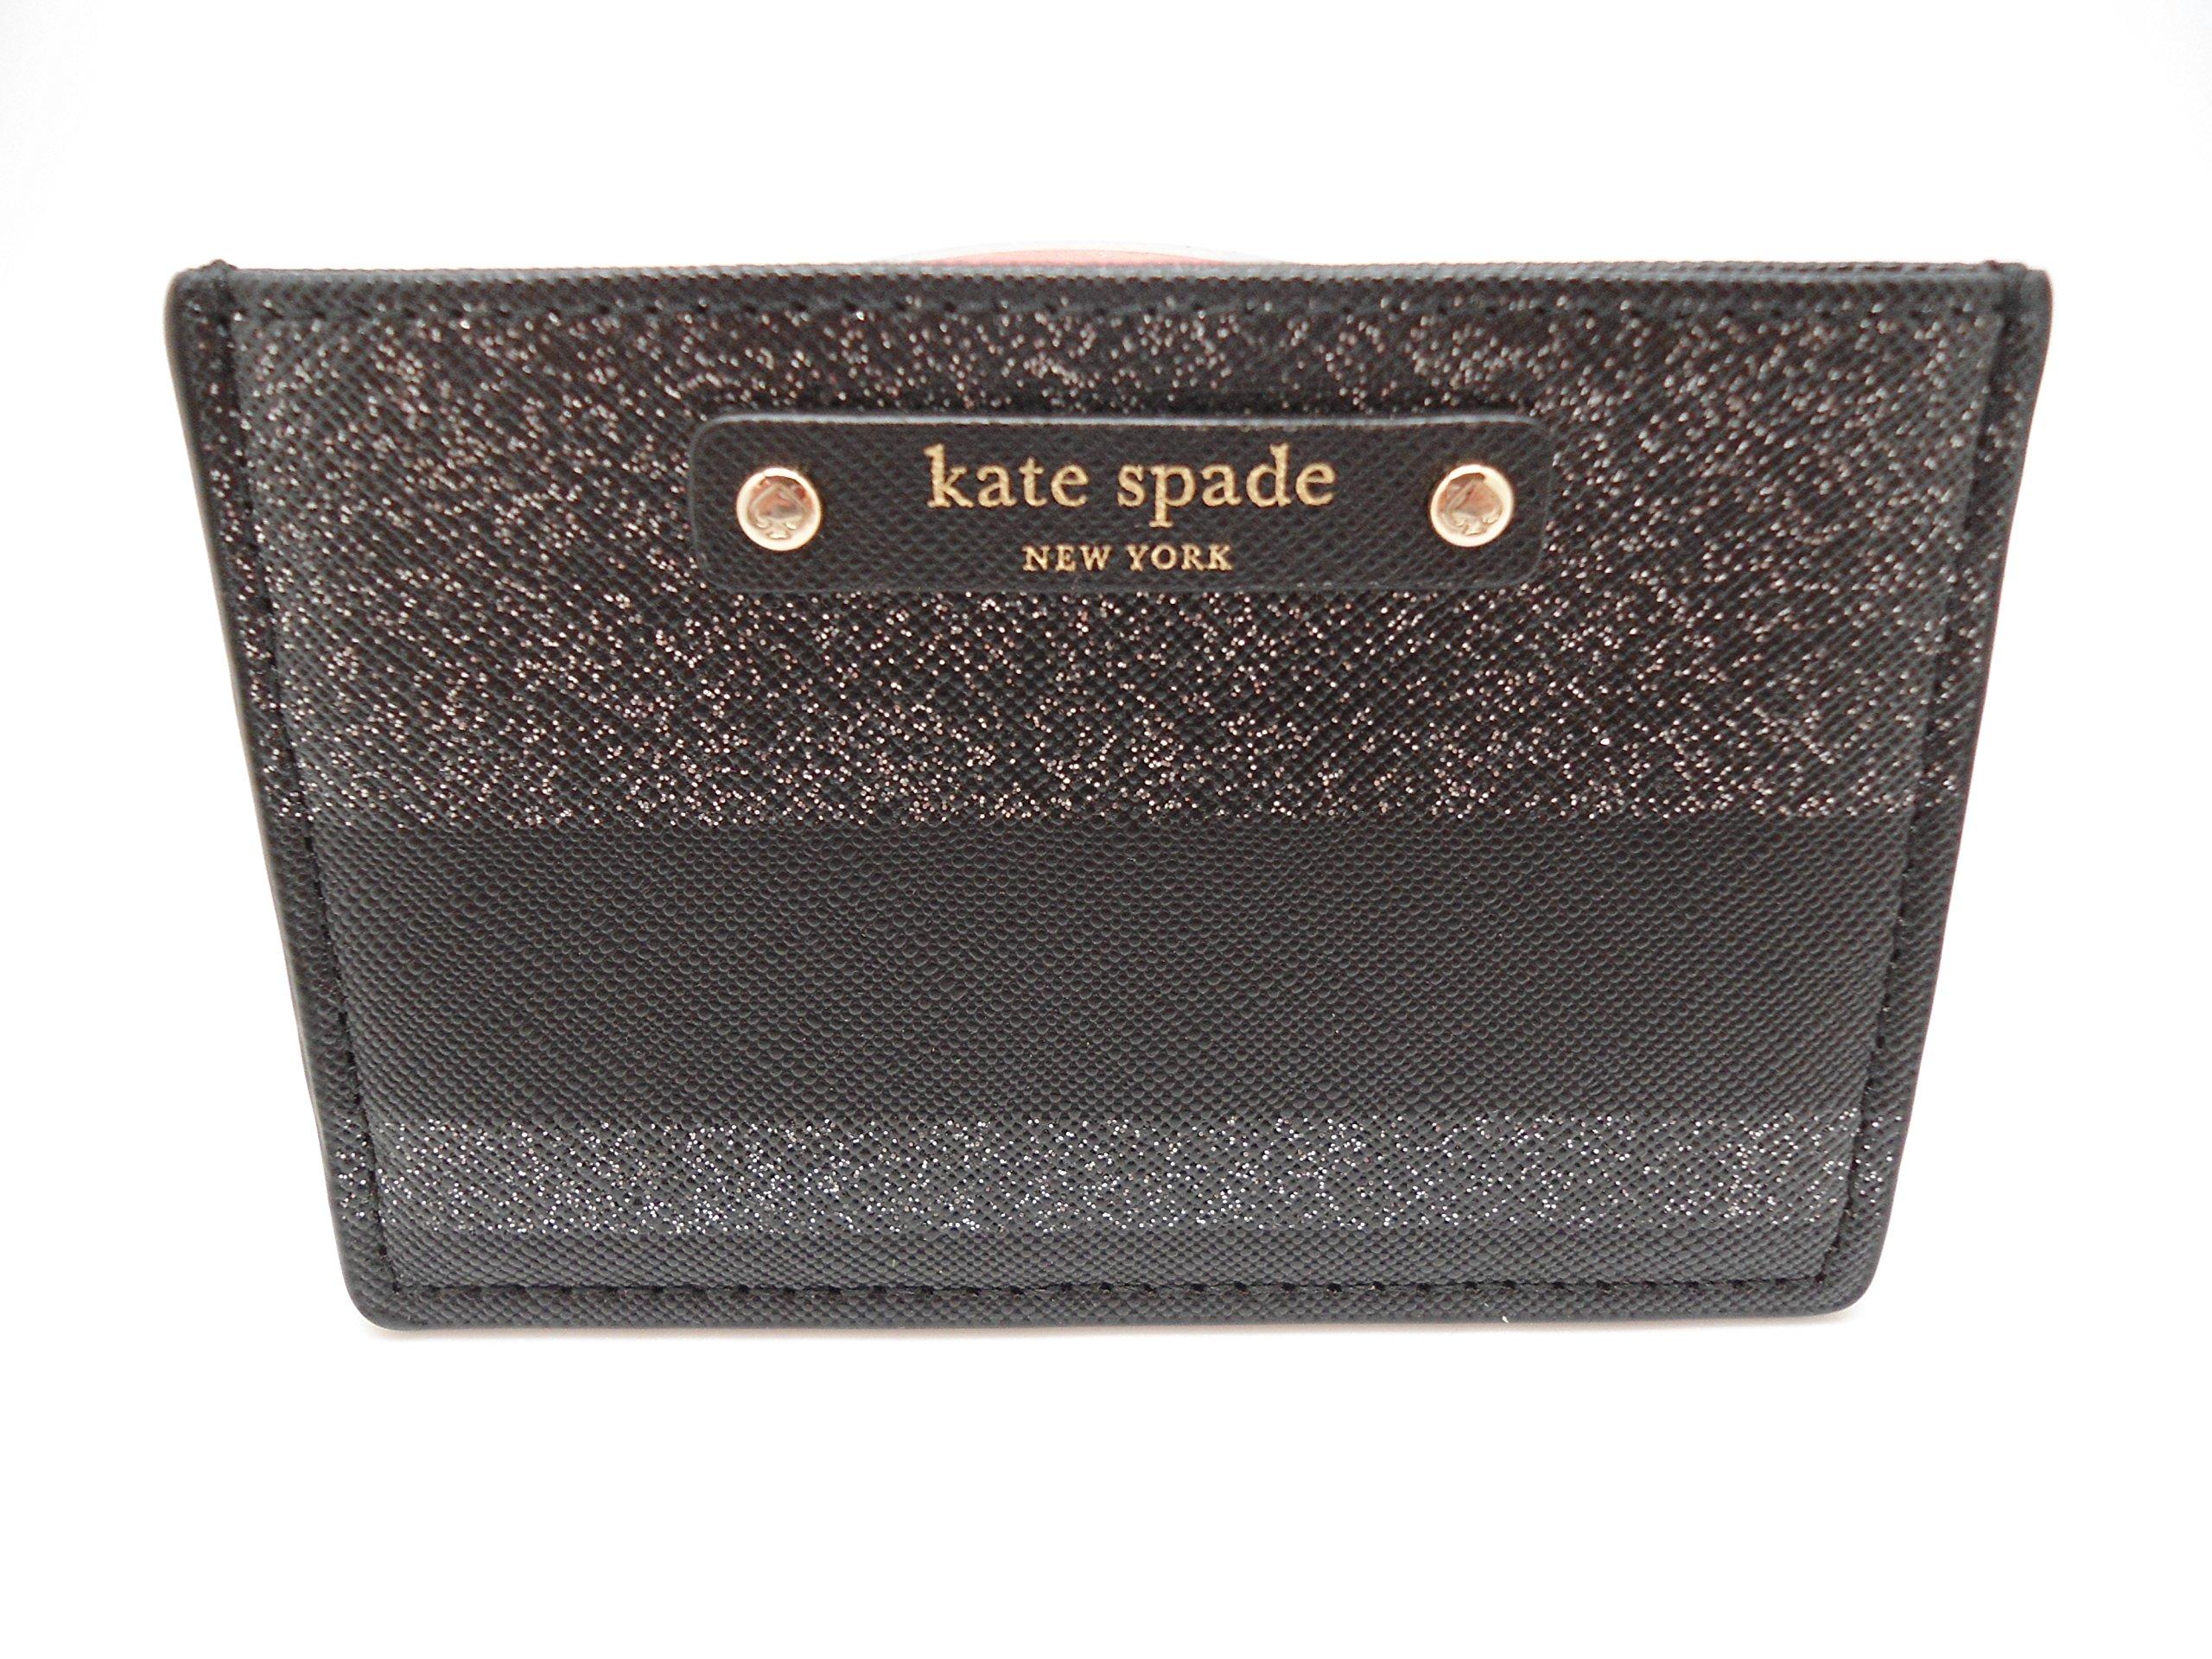 Kate Spade New York Haven Lane Graham Card Case Wallet Black /Glitter Stripes